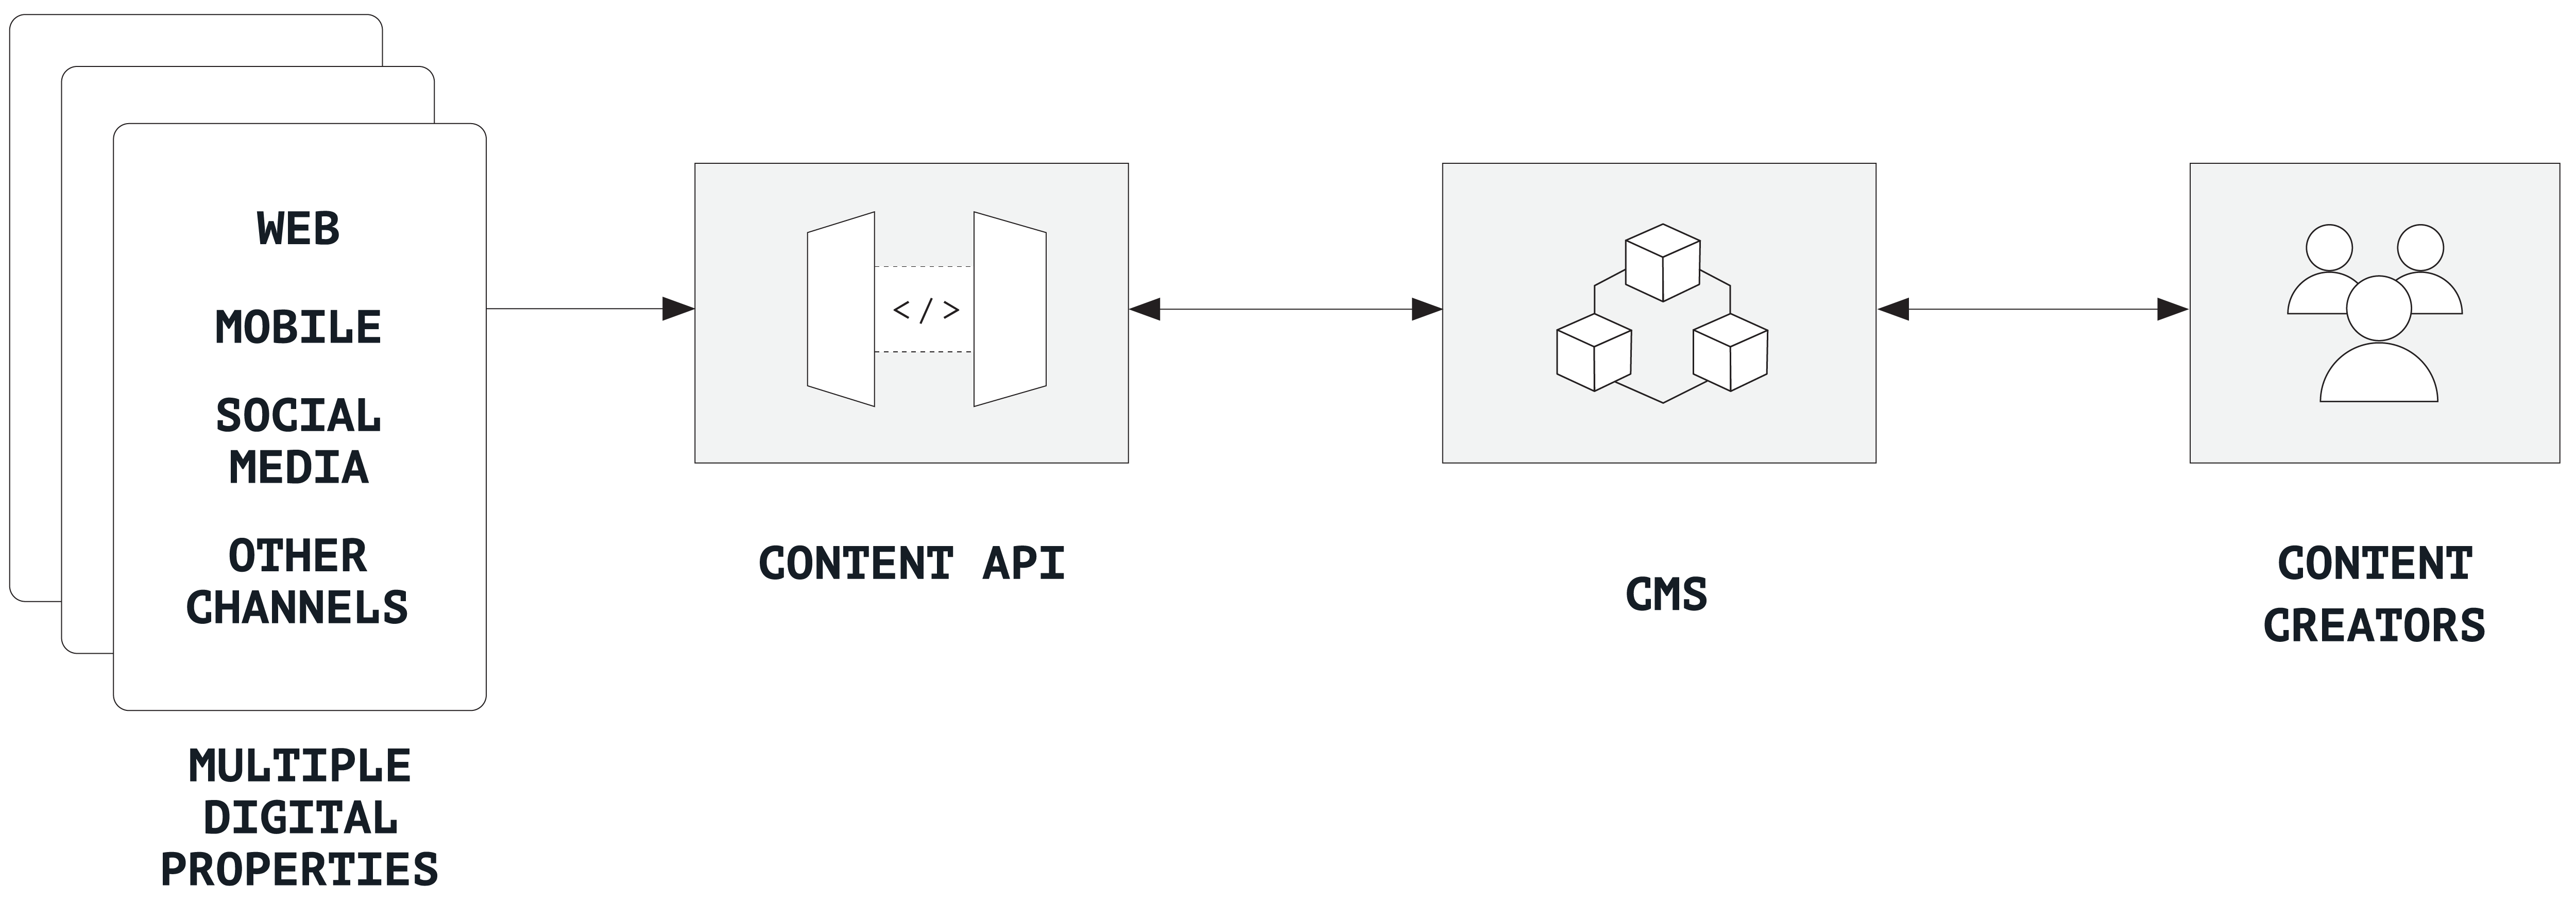 decoupled network content hub